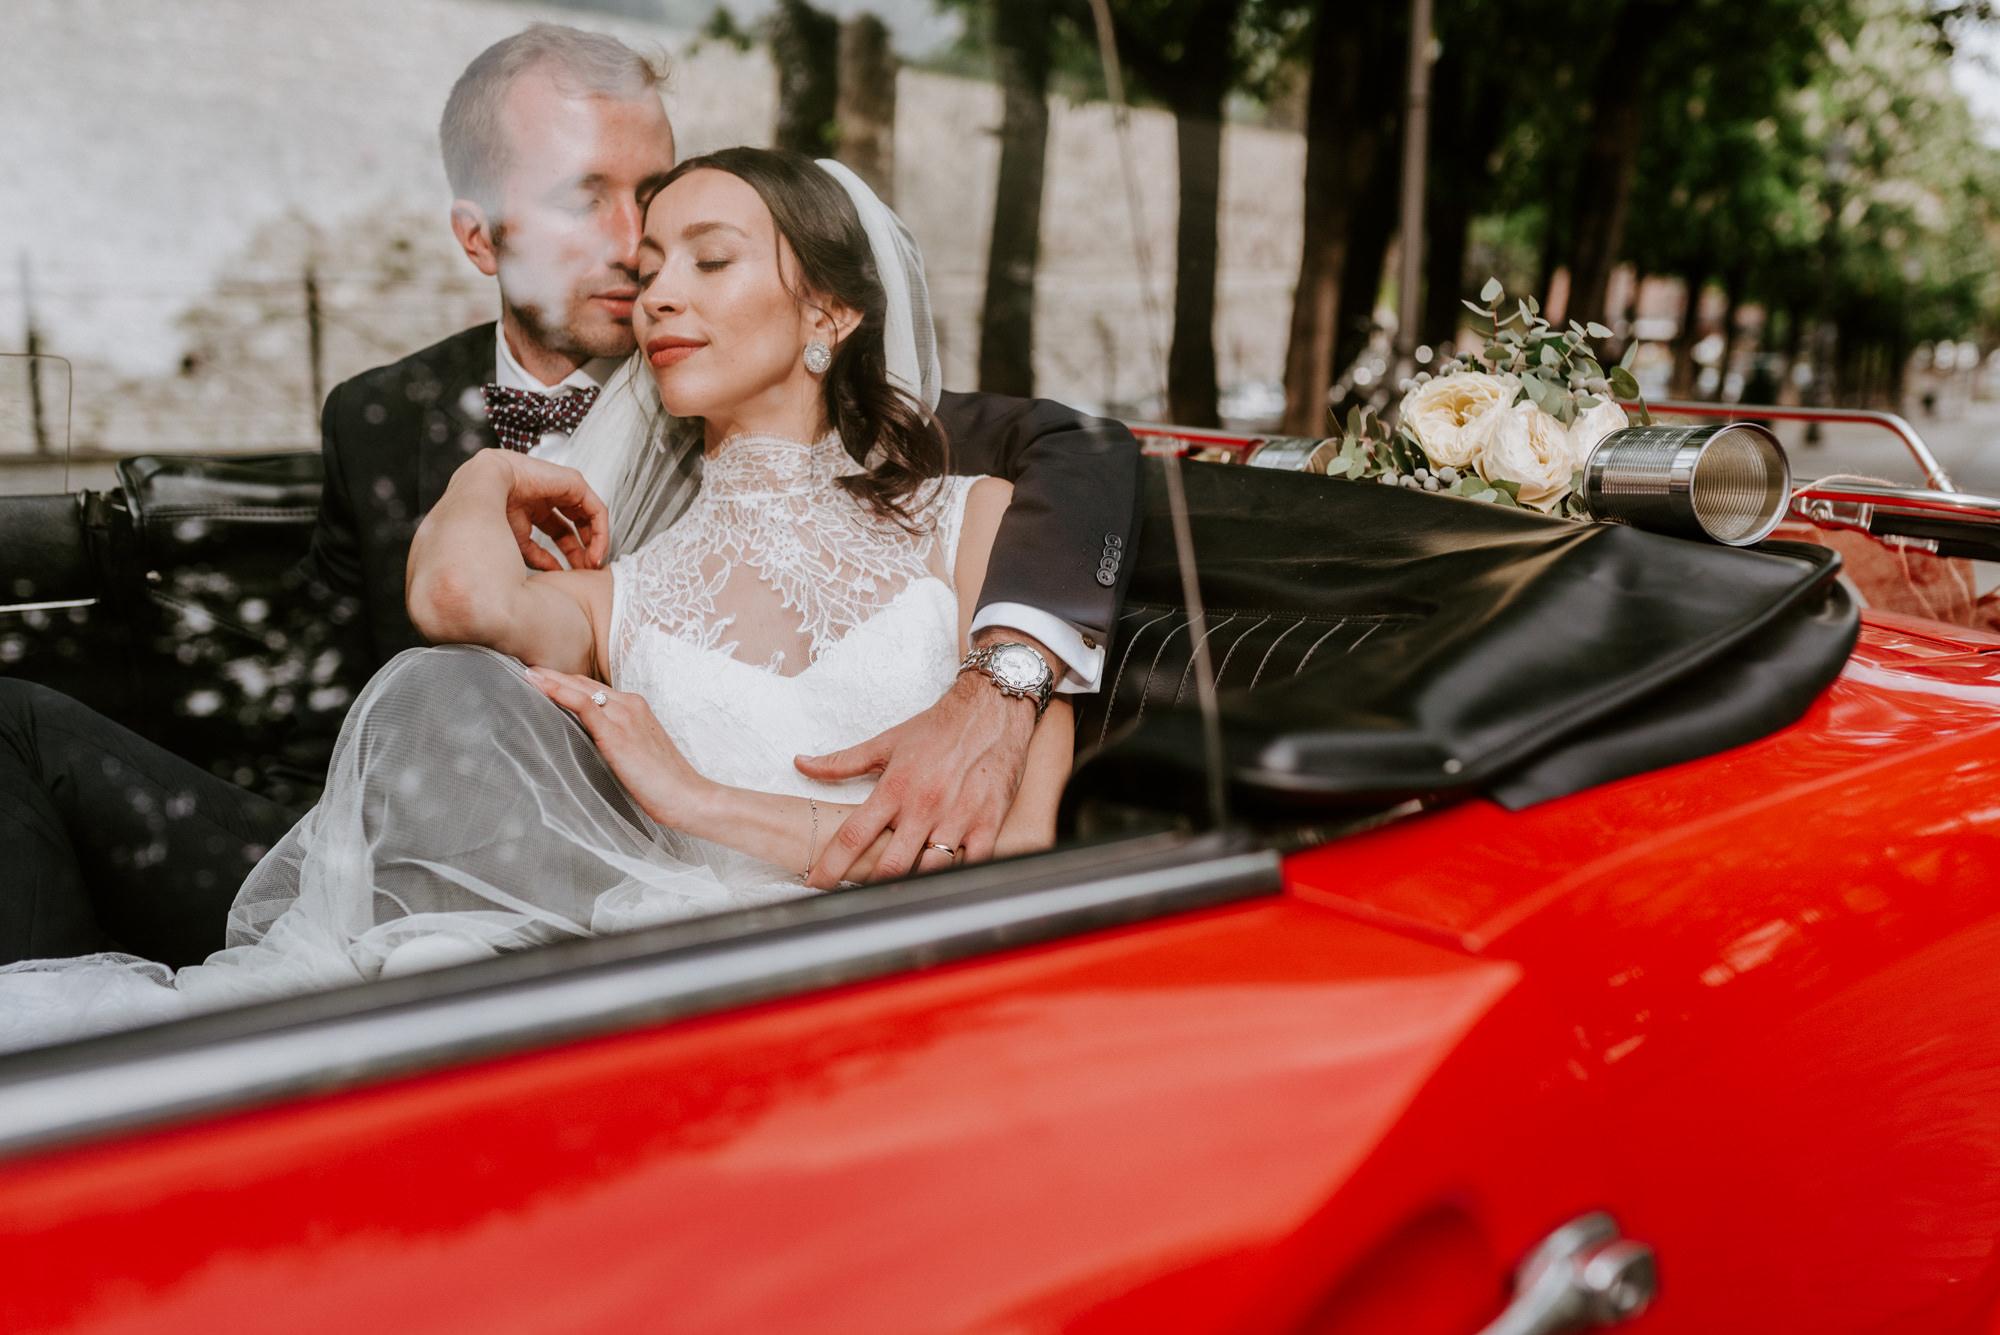 FOTO+PHOTO+BODA+WEDDING+ITALIA+ITALY+MAURICIO+GARAY+MAURICIOGARAY+WEDDINPHOTOGRAPHER+FOTOGRAFODEBODA-1328.jpg